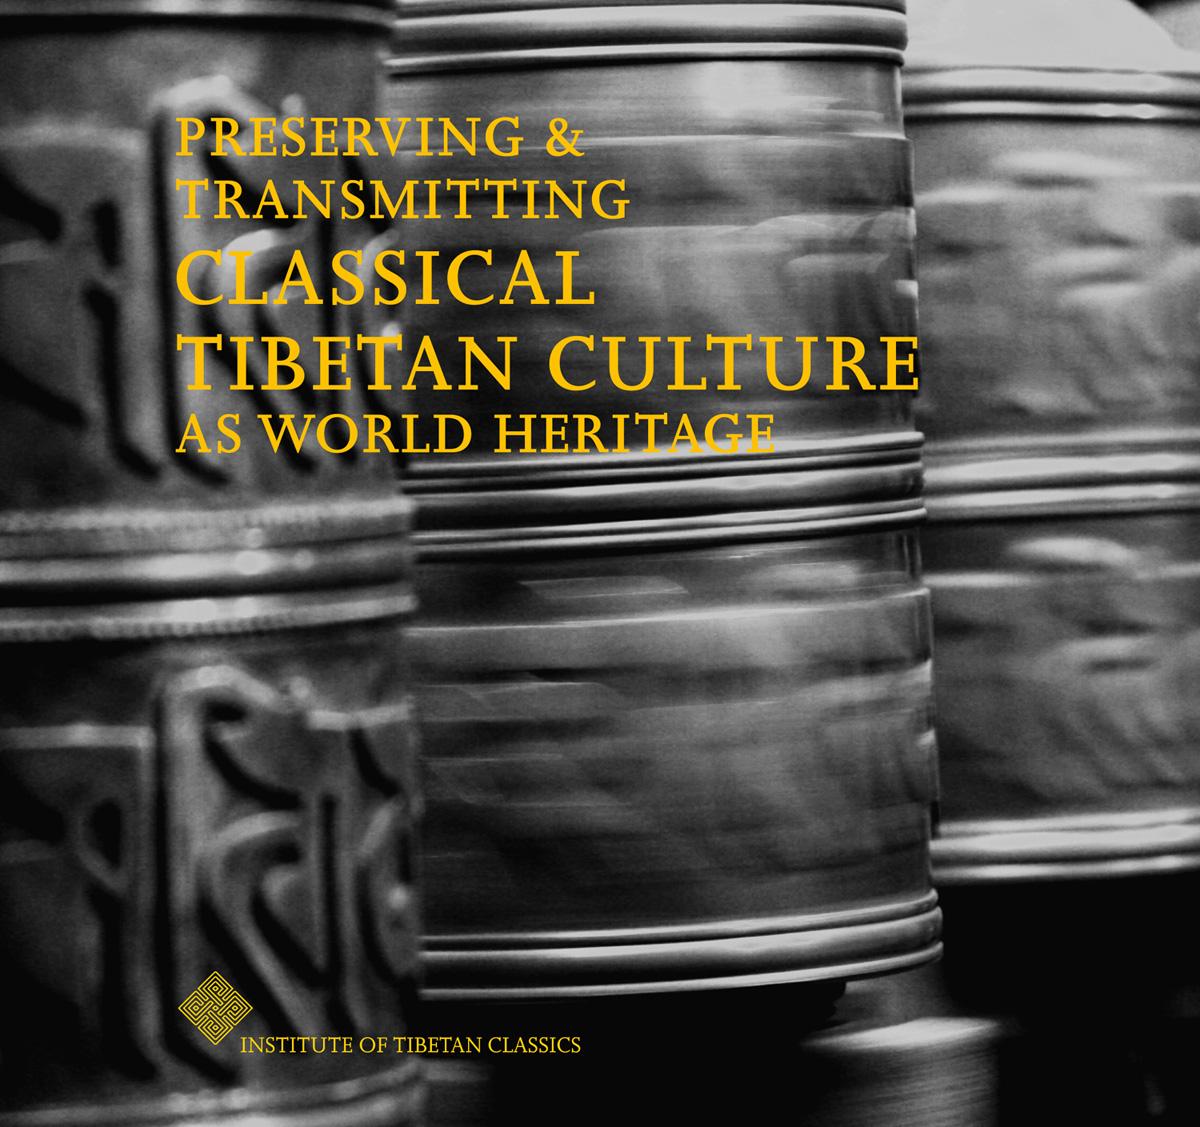 perserving & transmitting classical tibetan culture